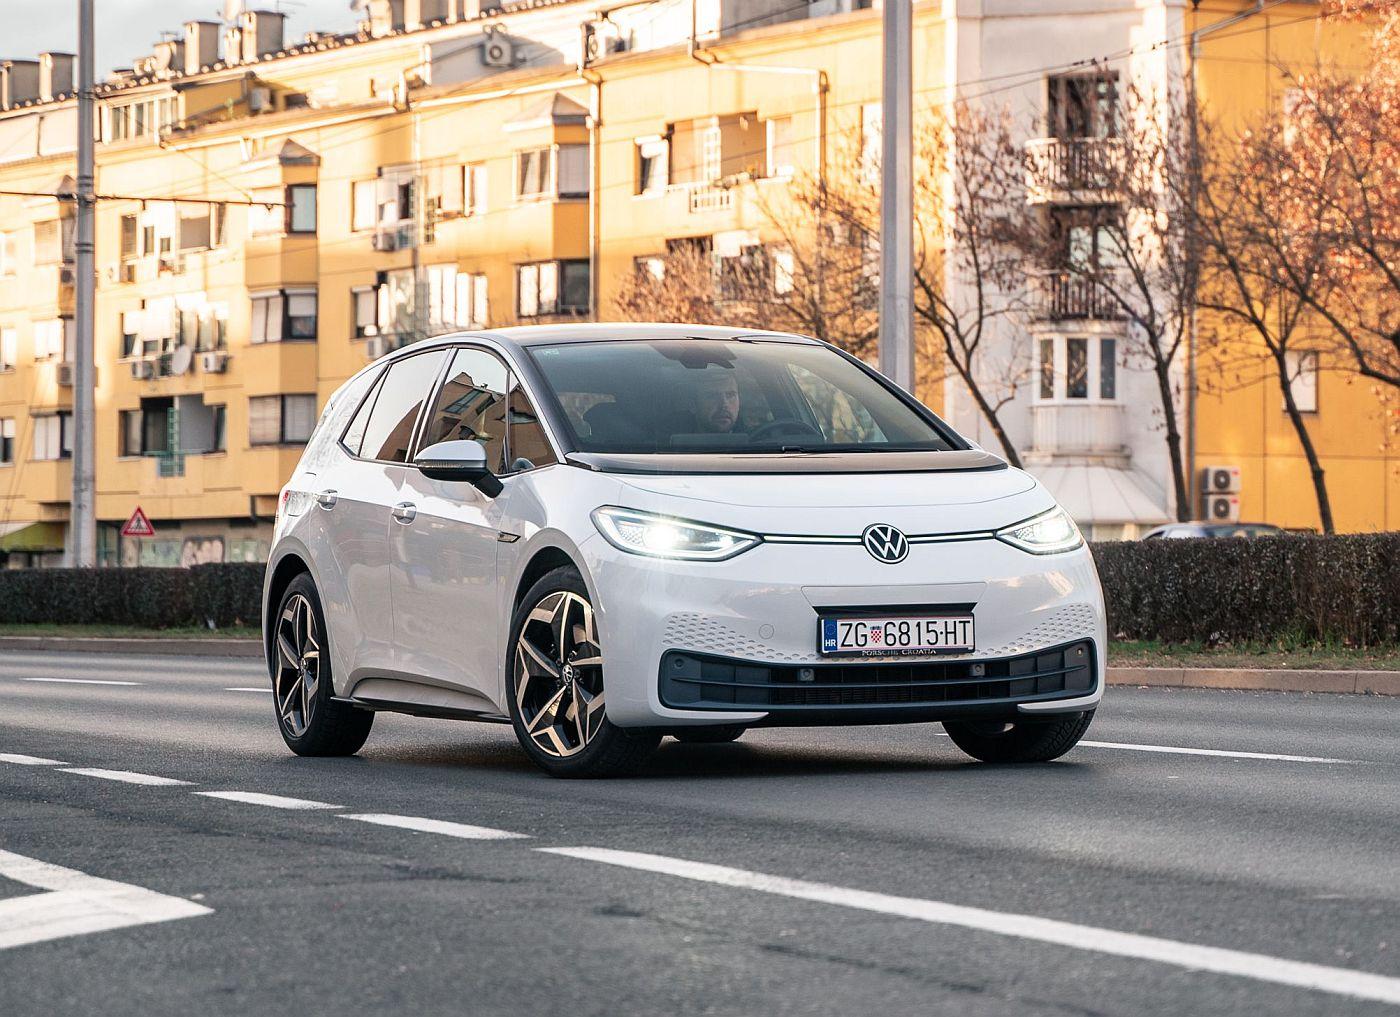 Volkswagen ID.3 Pro Power 1st Edition Plus, s razlogom spreman preuzet titulu novog kralja Wolfsburga